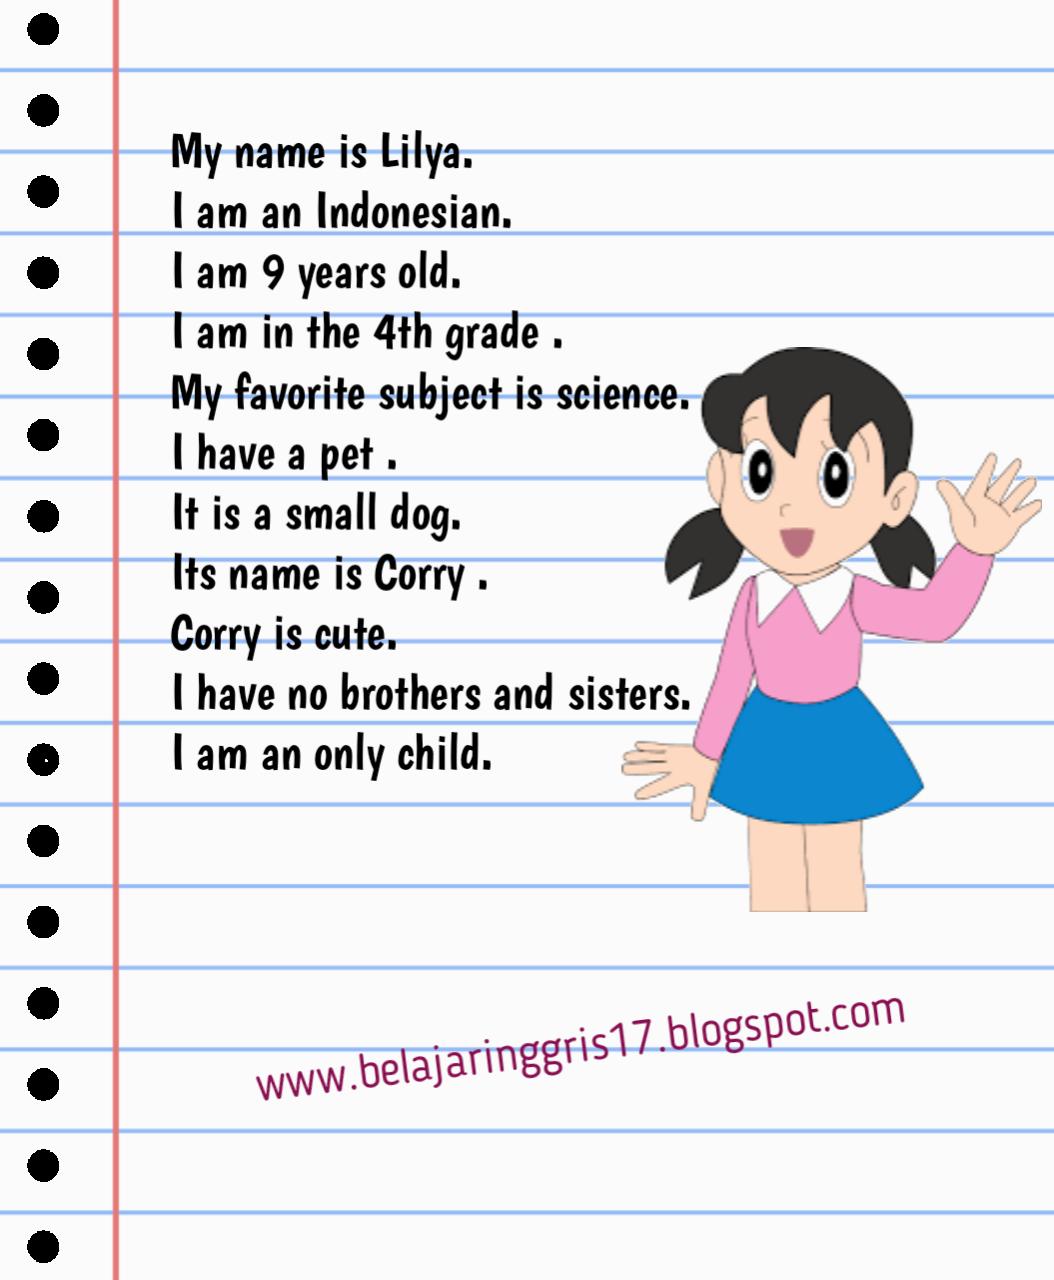 Perkenalan Diri Part 1 Bahasa Inggris Belajar Inggris